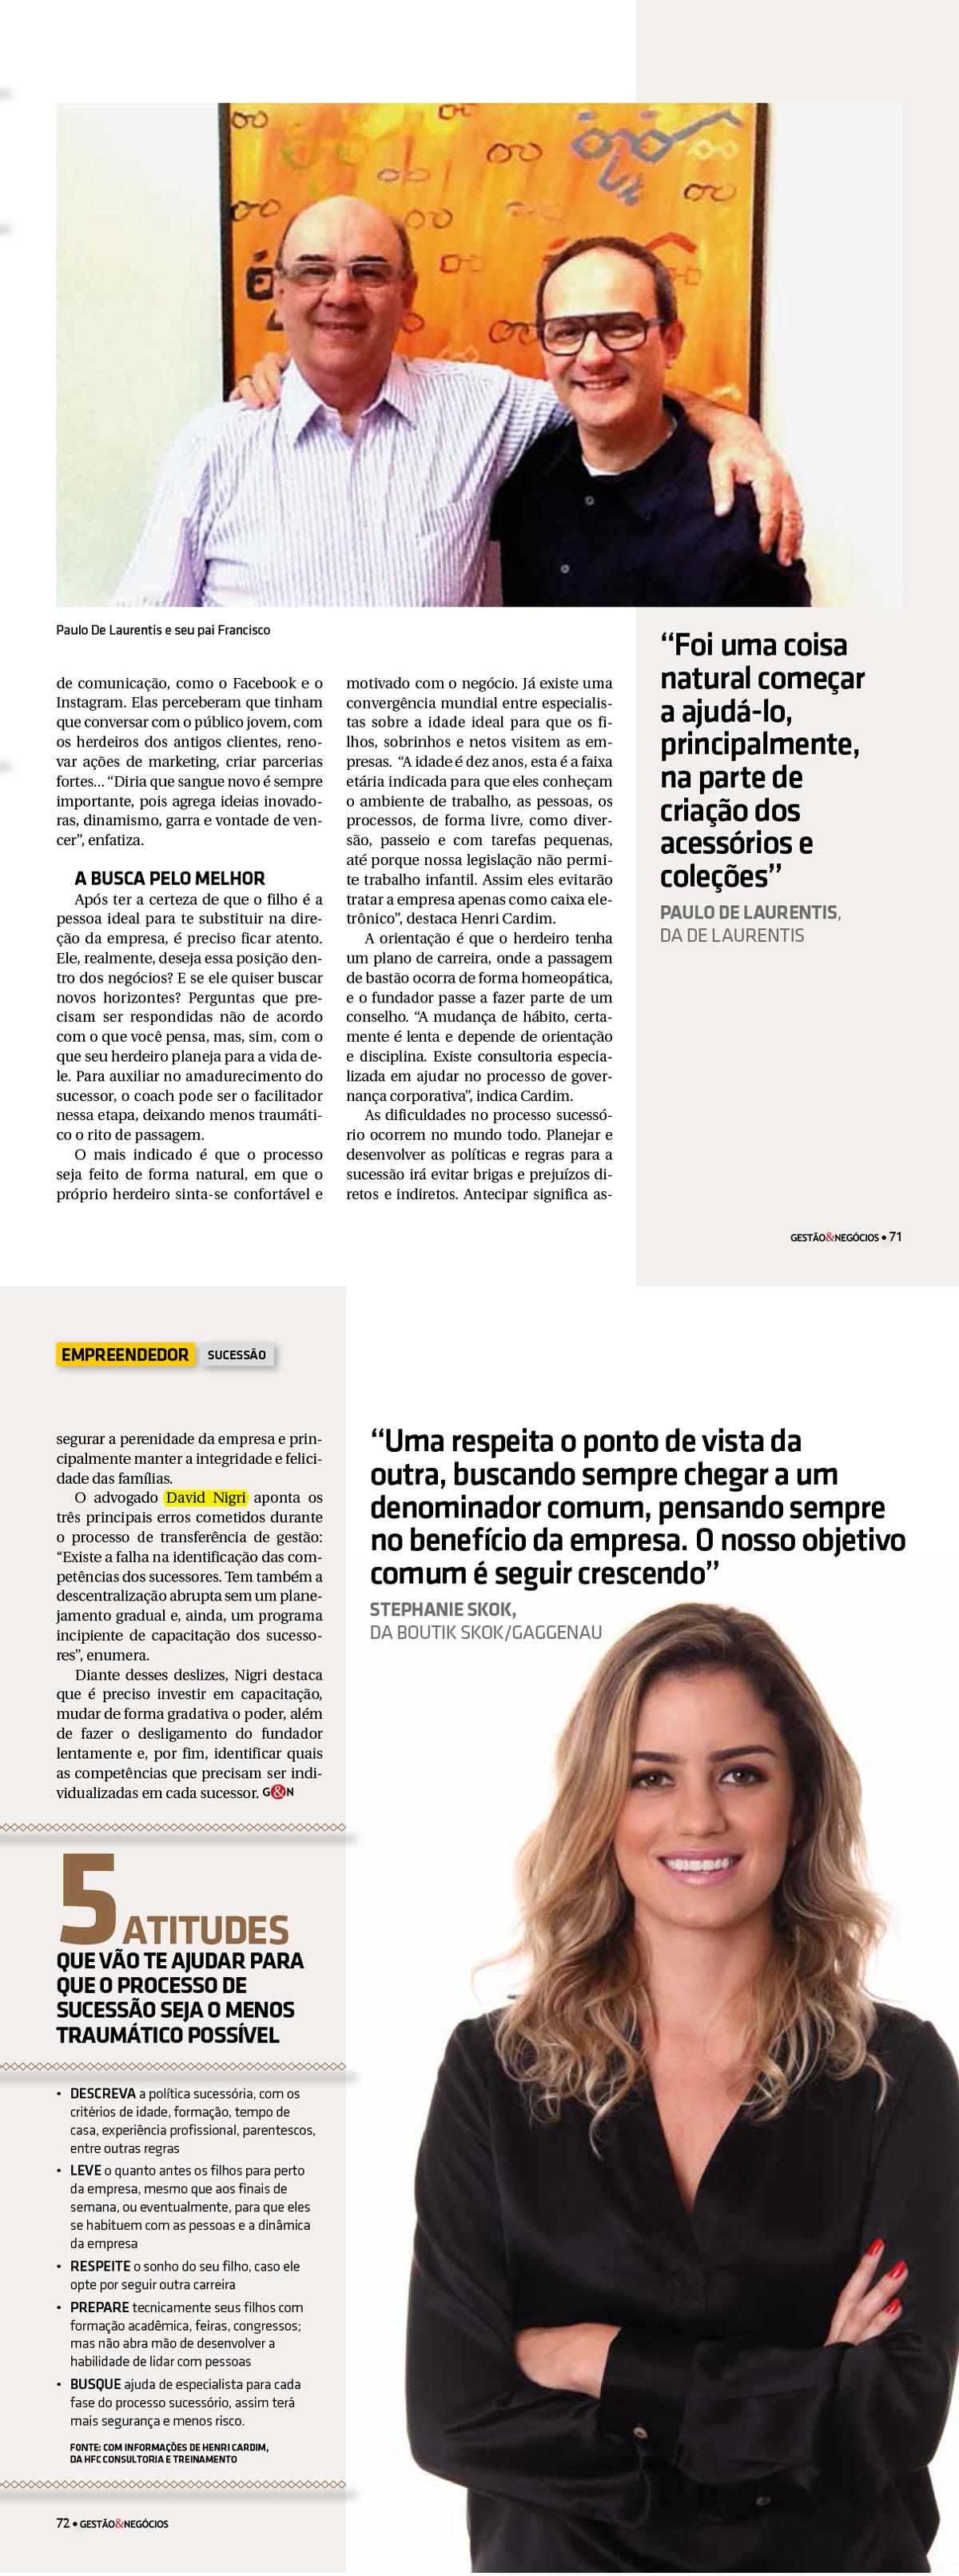 edicao-68-da-revista-Gestao-Negocios-2